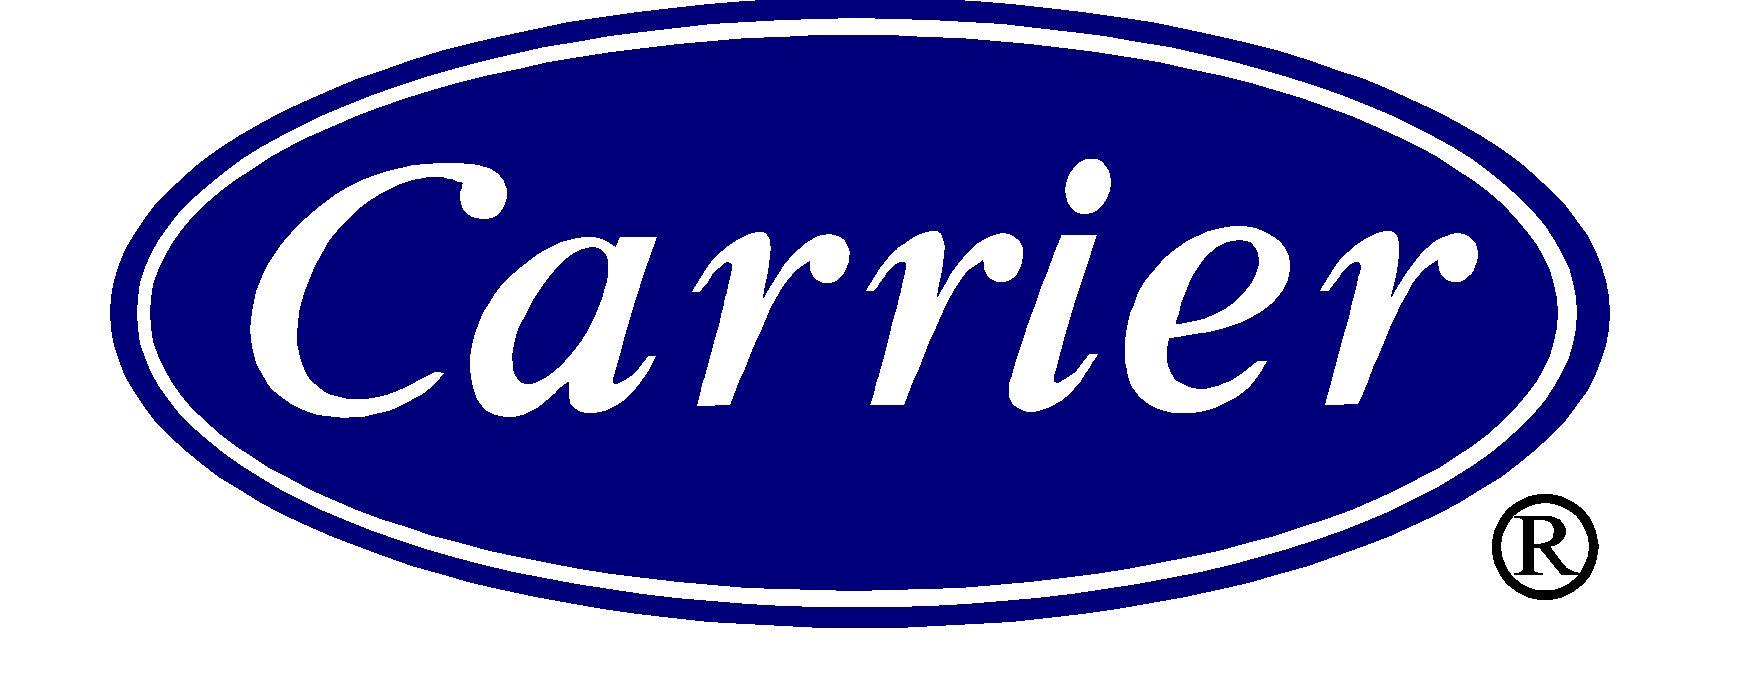 Carrier.